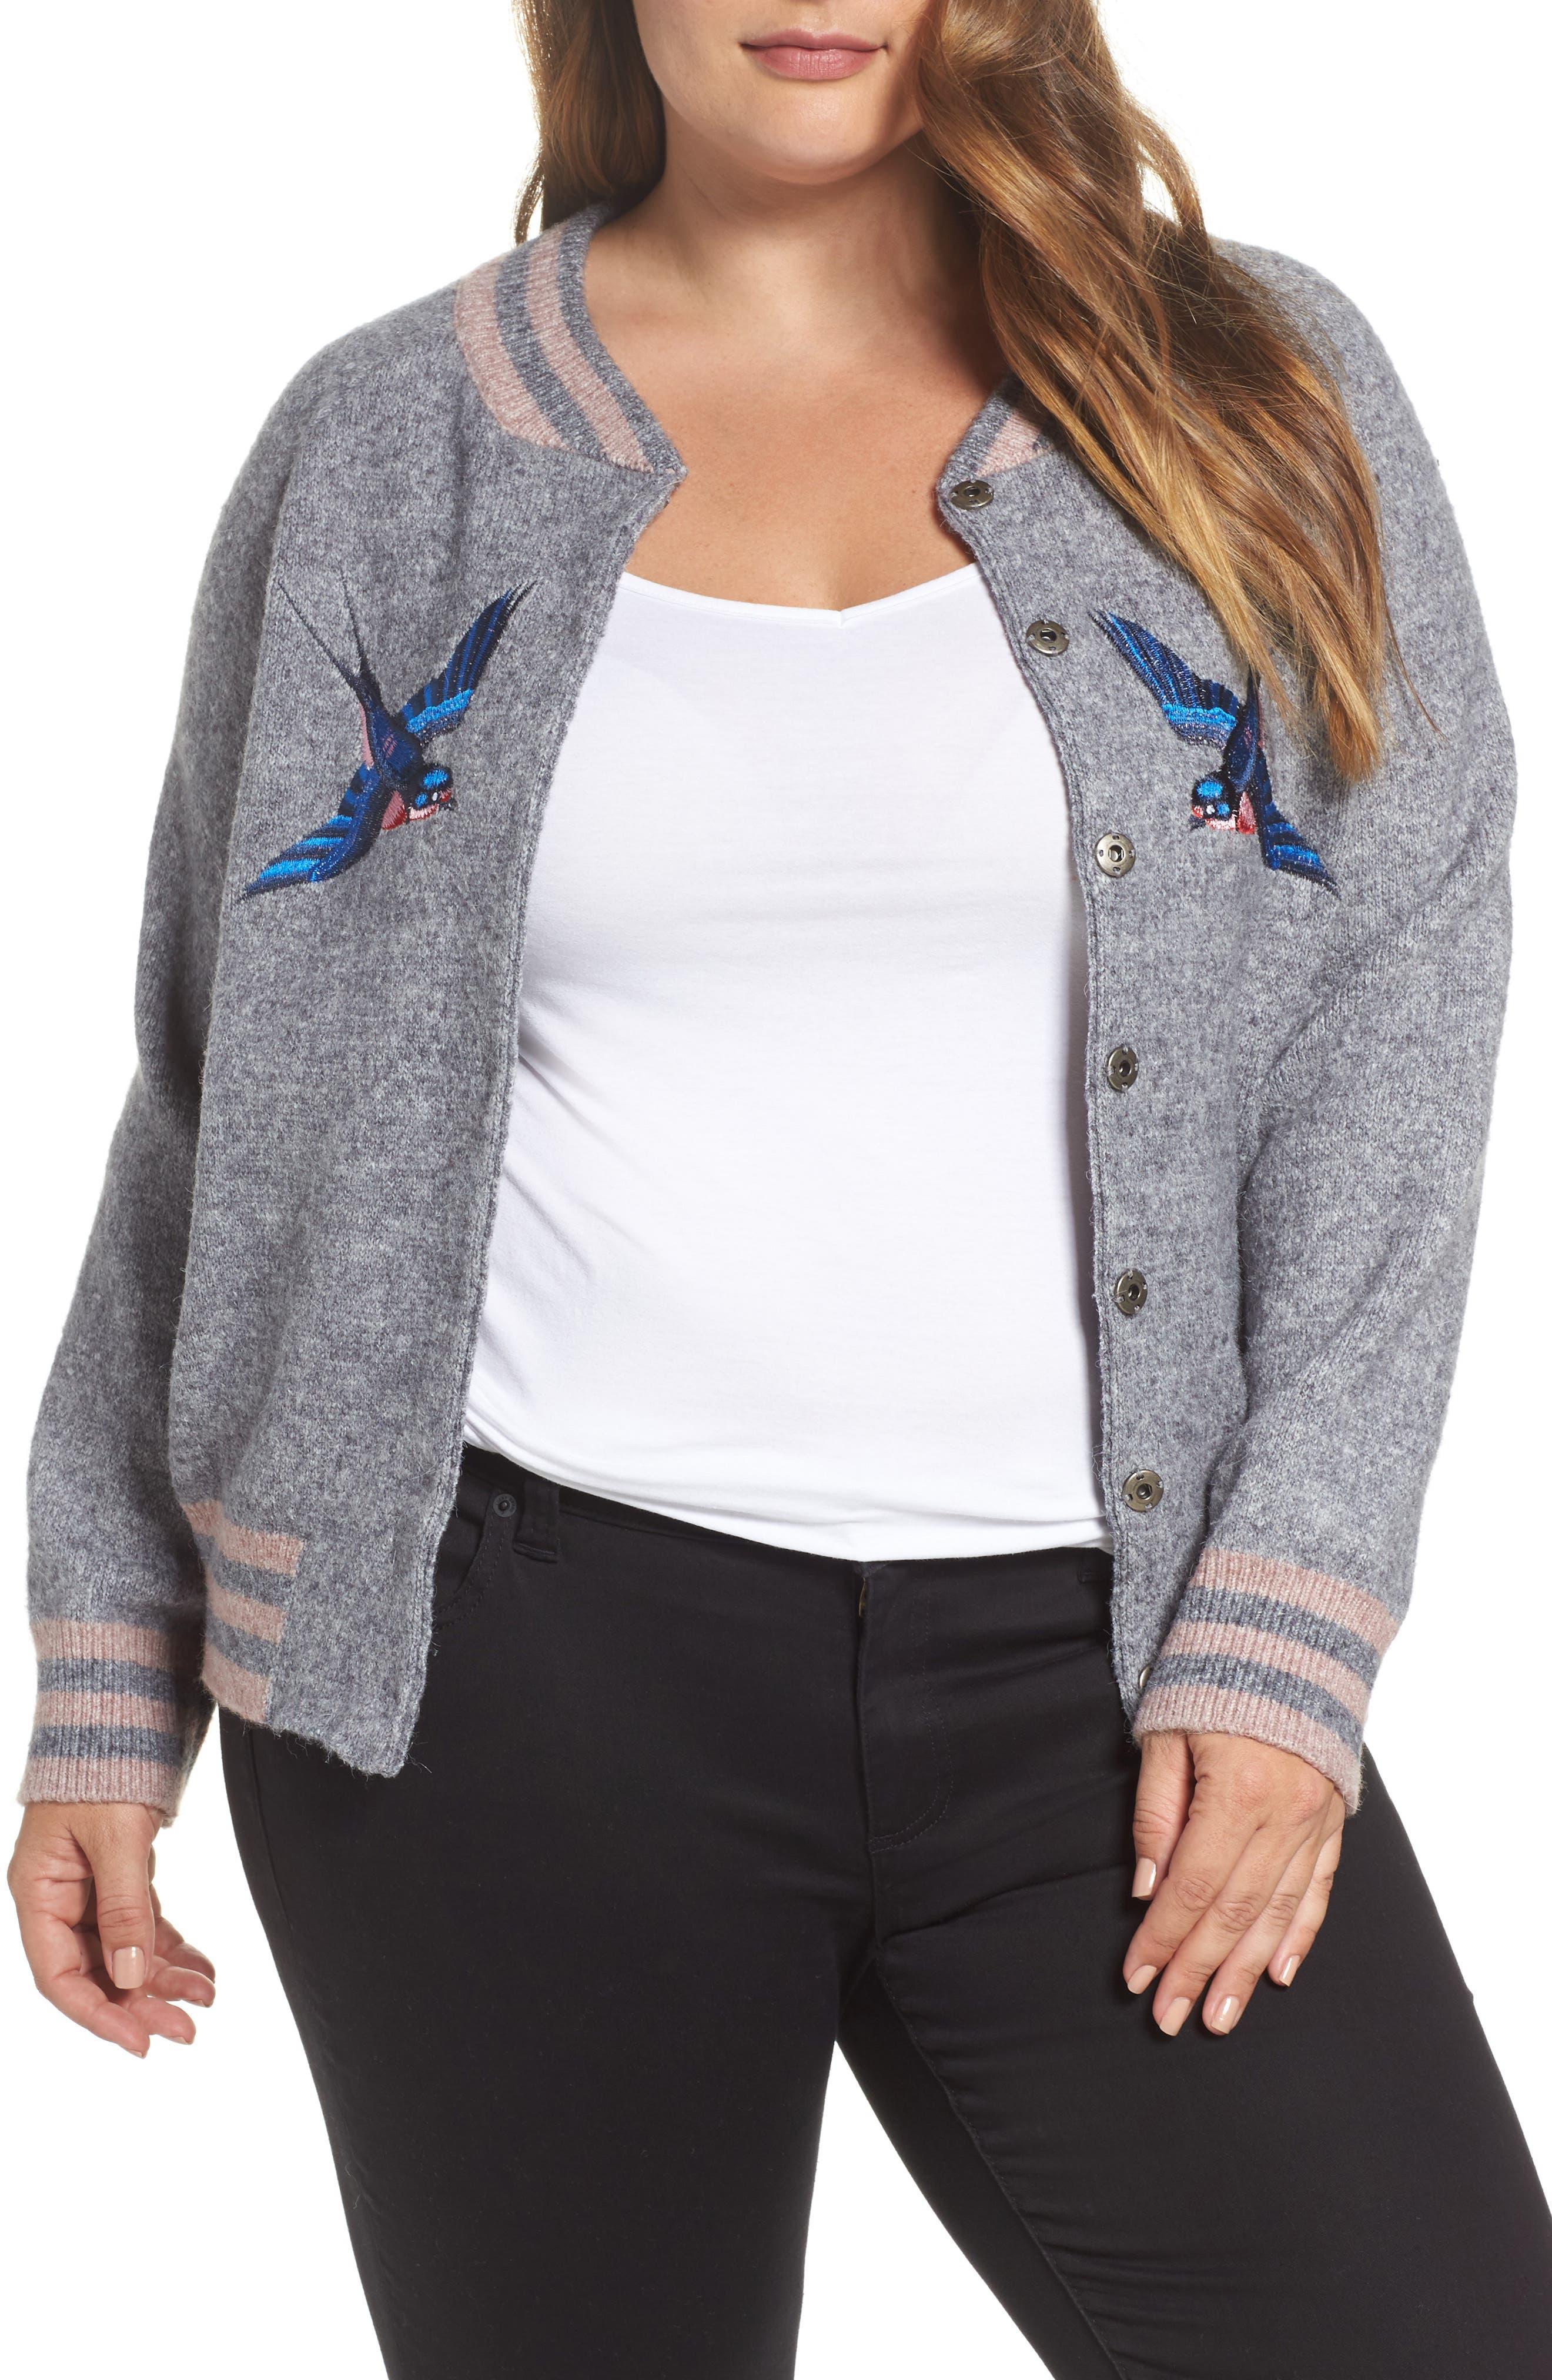 Zanja Embroidered Knit Bomber Jacket,                             Main thumbnail 1, color,